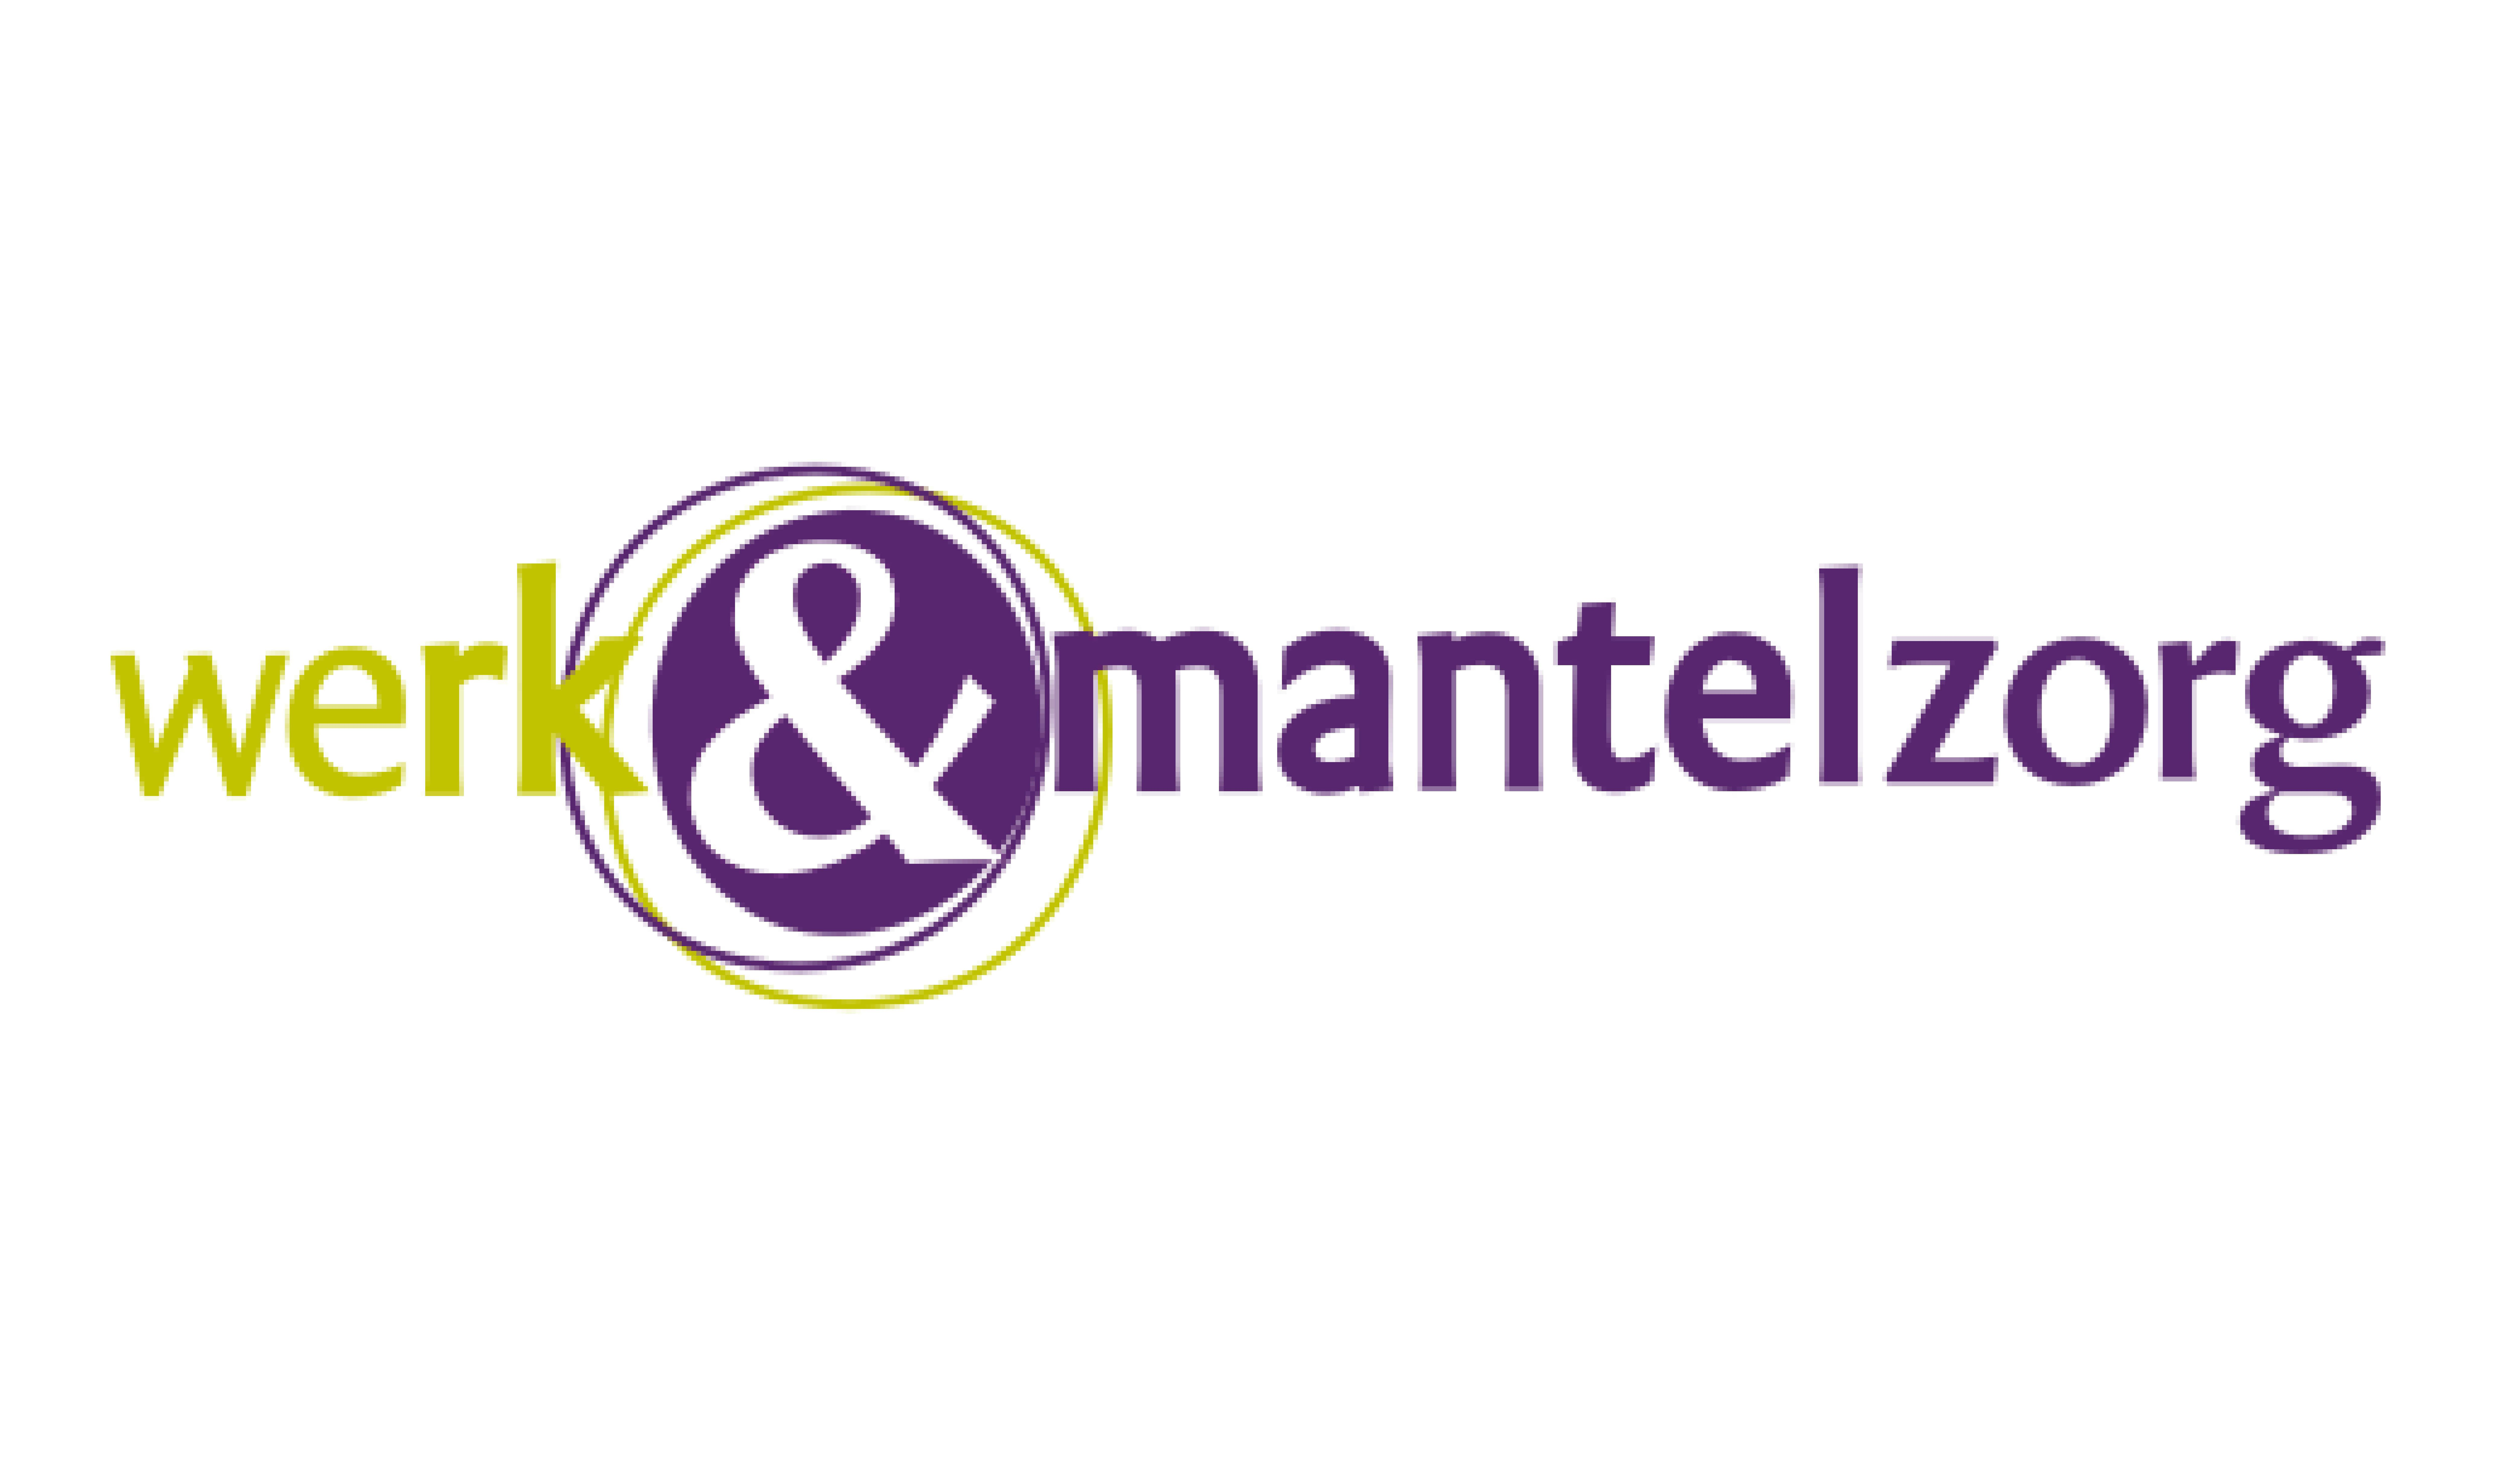 Interview werk & mantelzorg (i.o.v. PEP Den Haag)